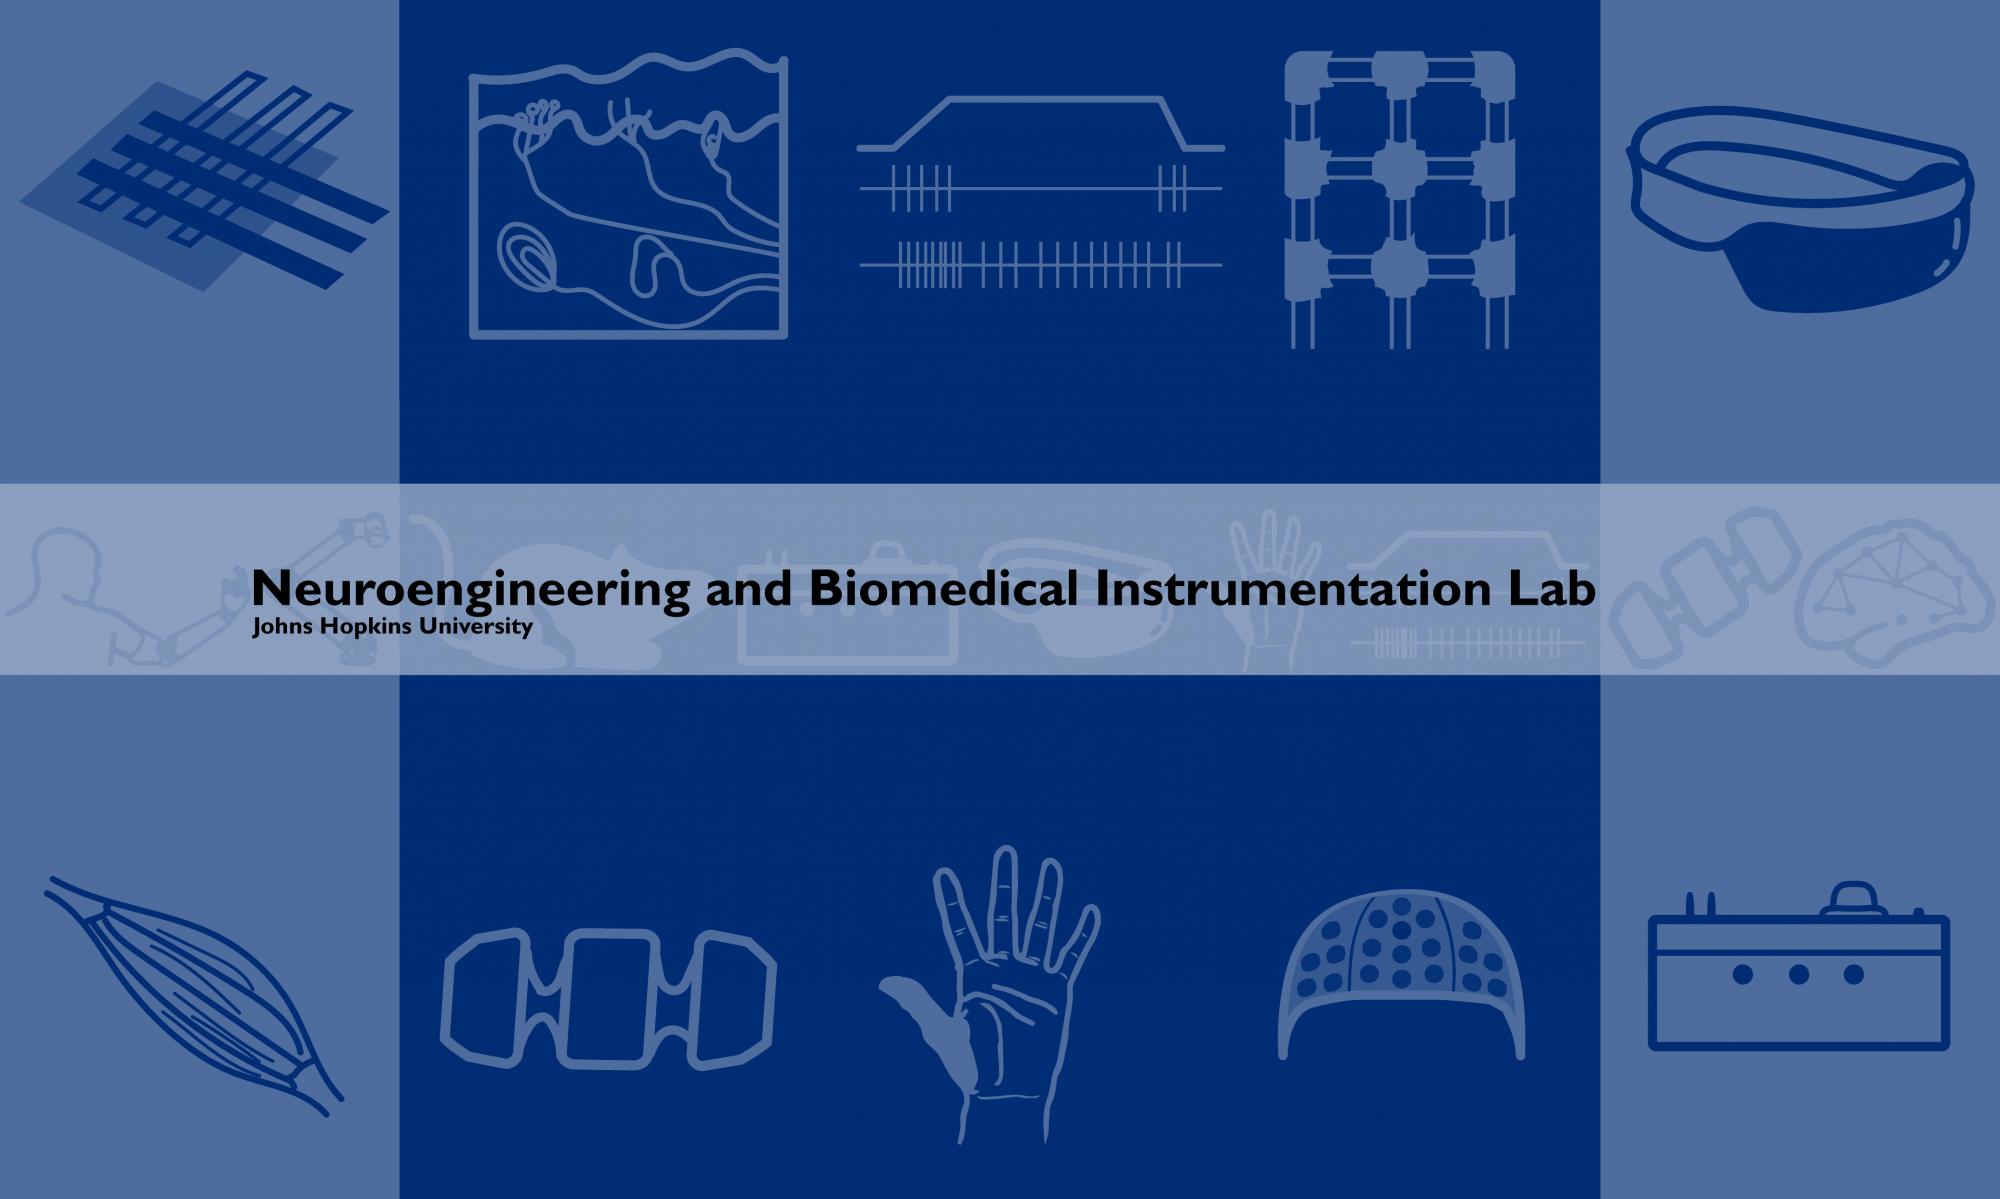 Neuroengineering & Biomedical Instrumentation Lab